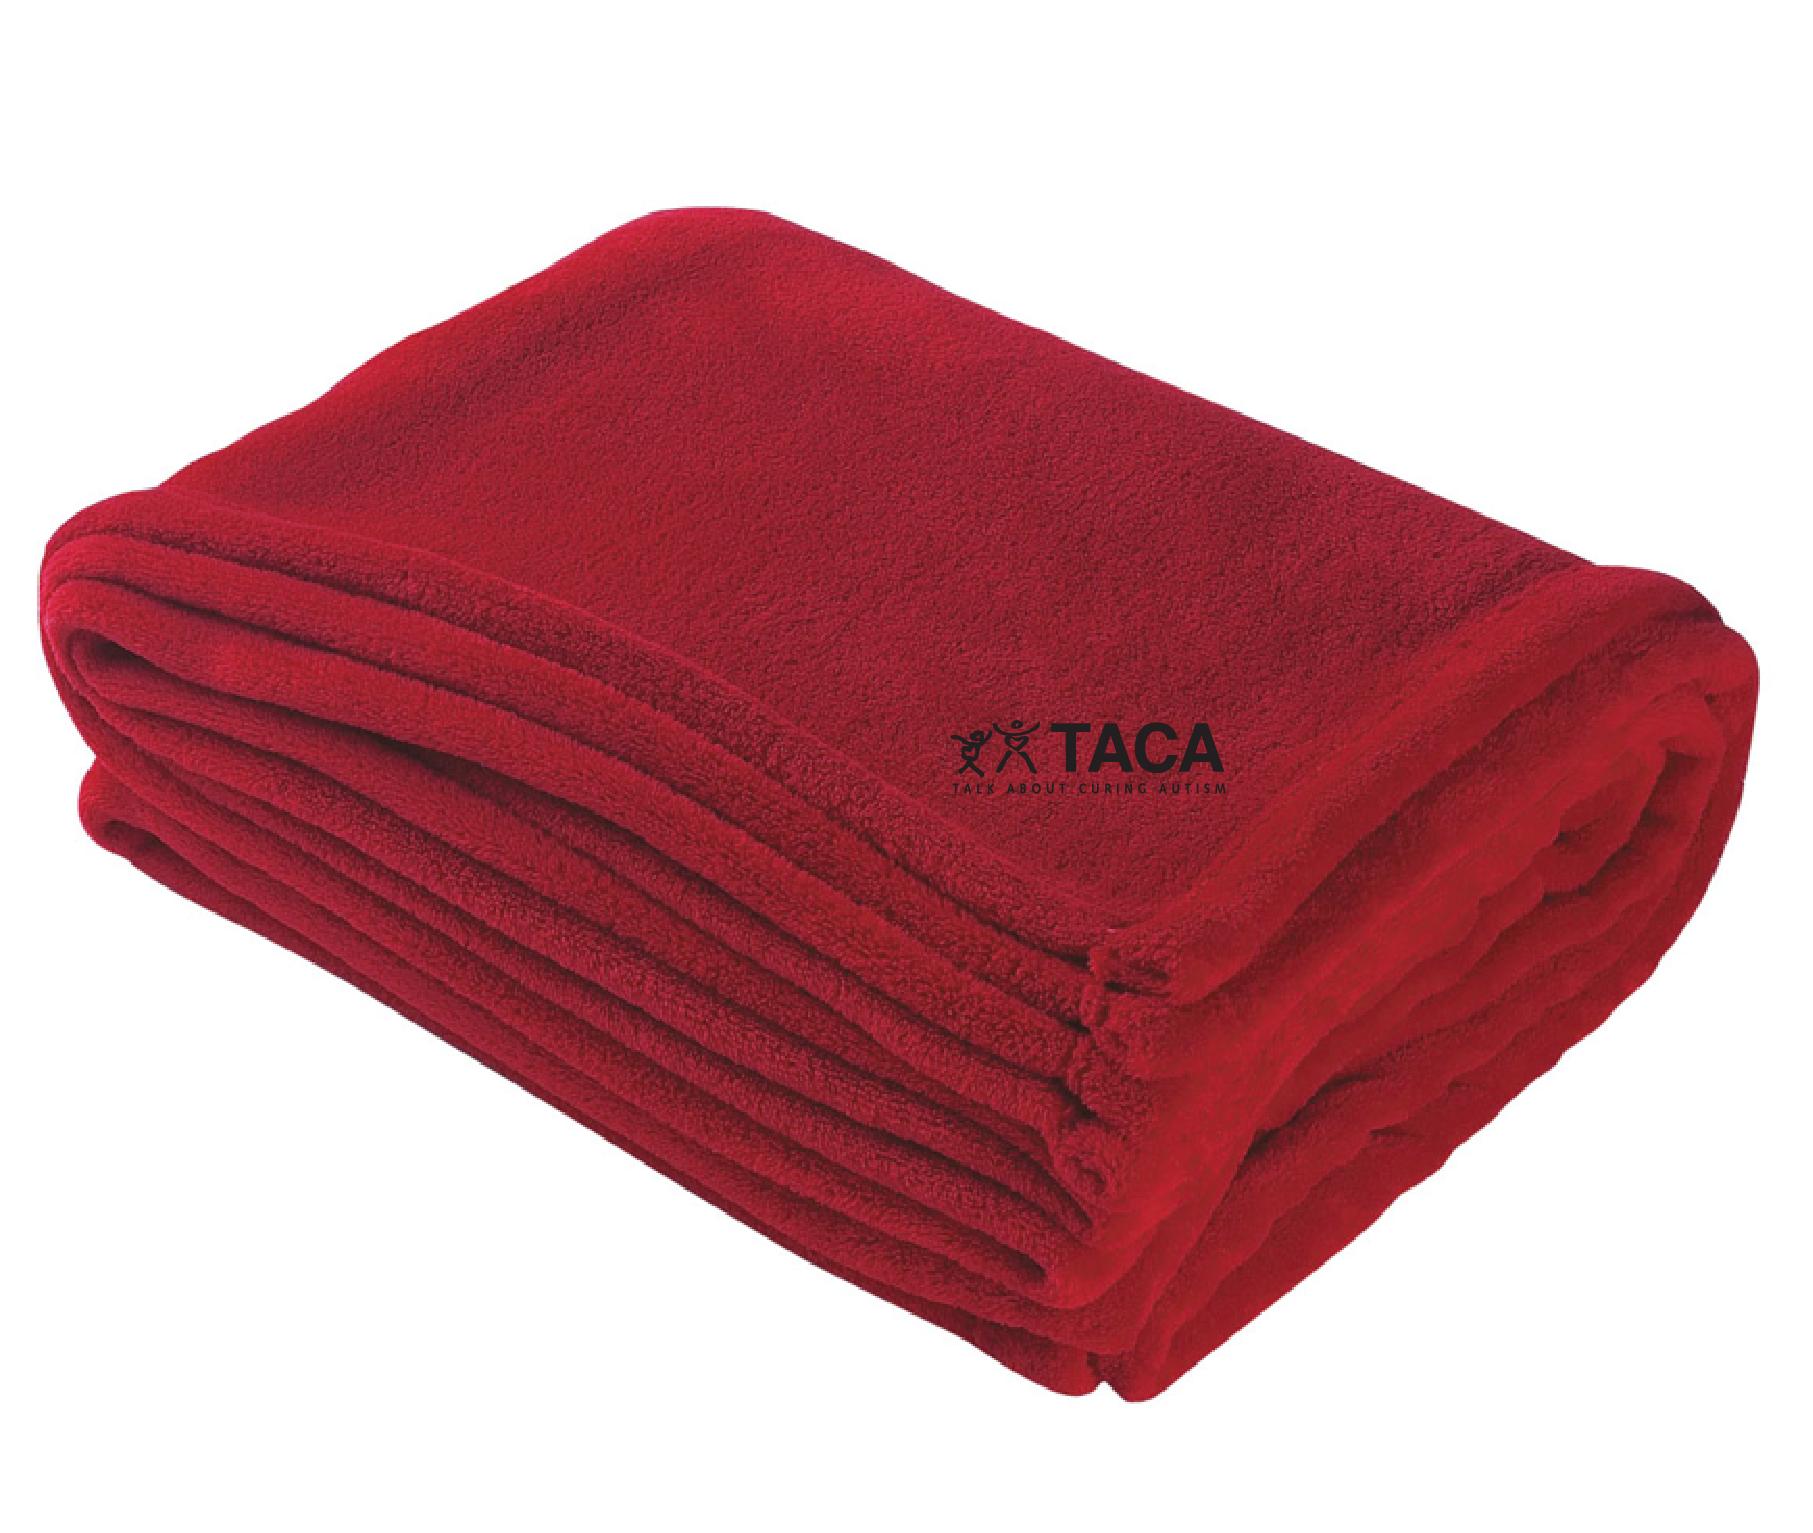 Taca accessories. Blanket clipart red blanket